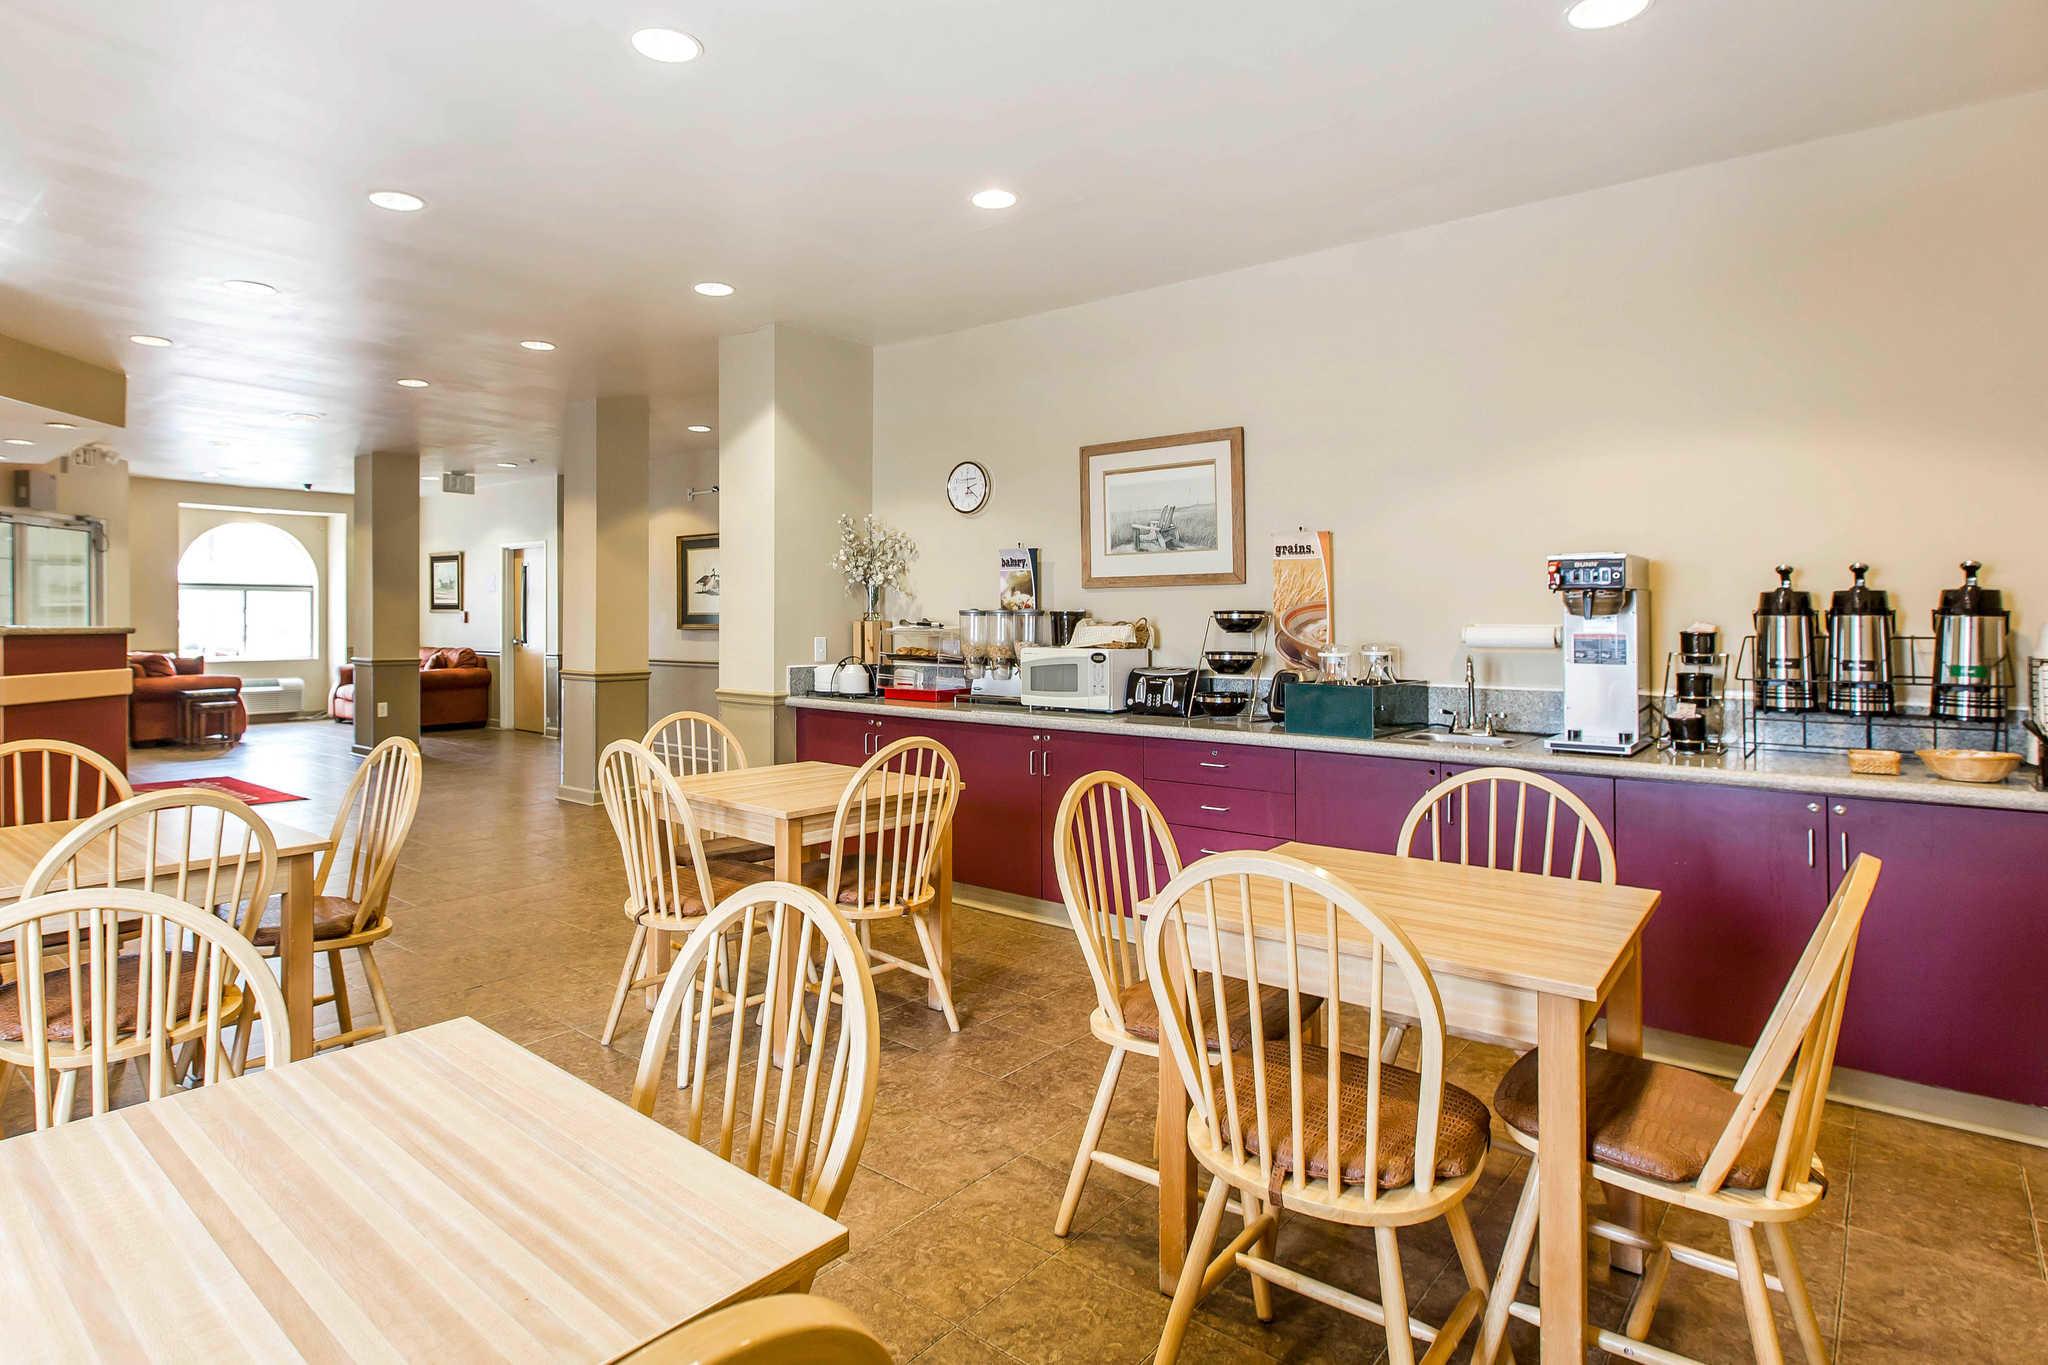 Breakfast Restaurants In Shallotte Nc